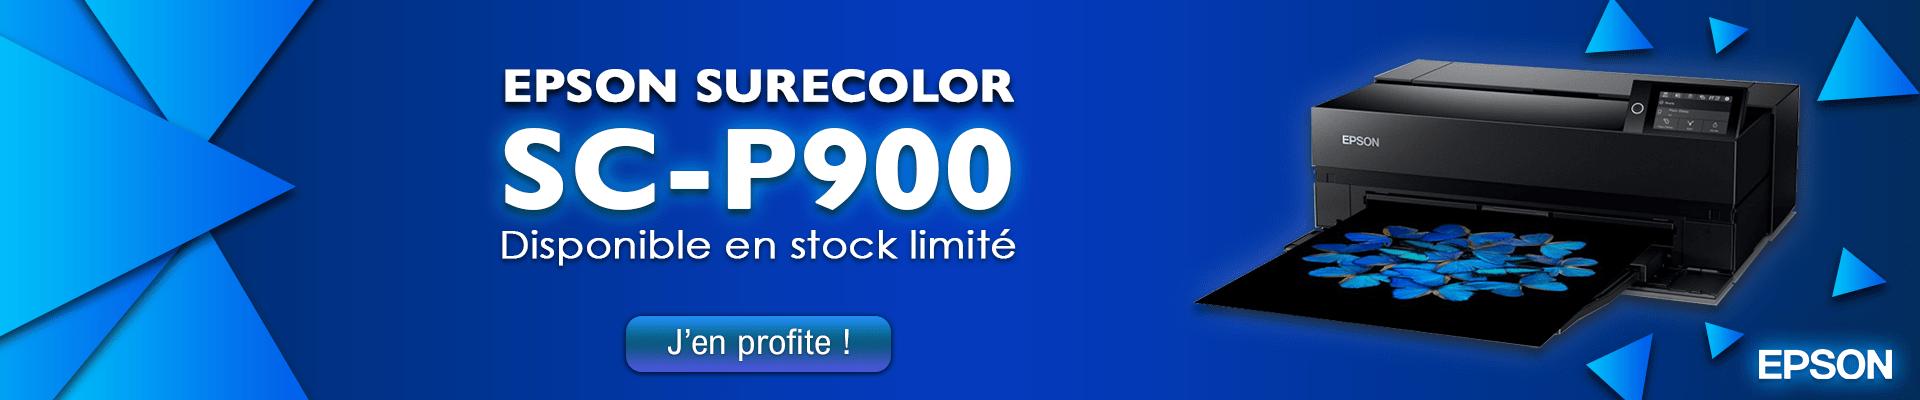 6863354-1630400629